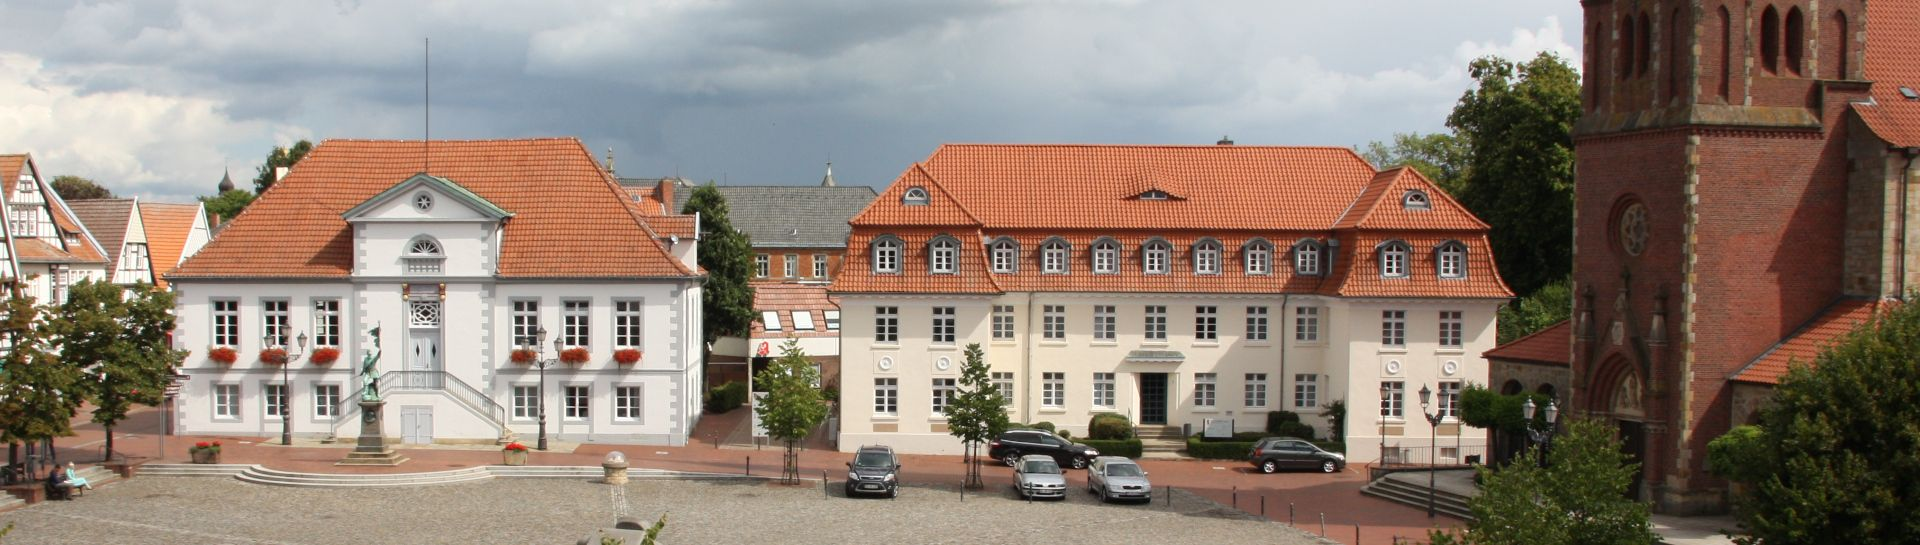 QB Rathaus Markt2 Marienkirche